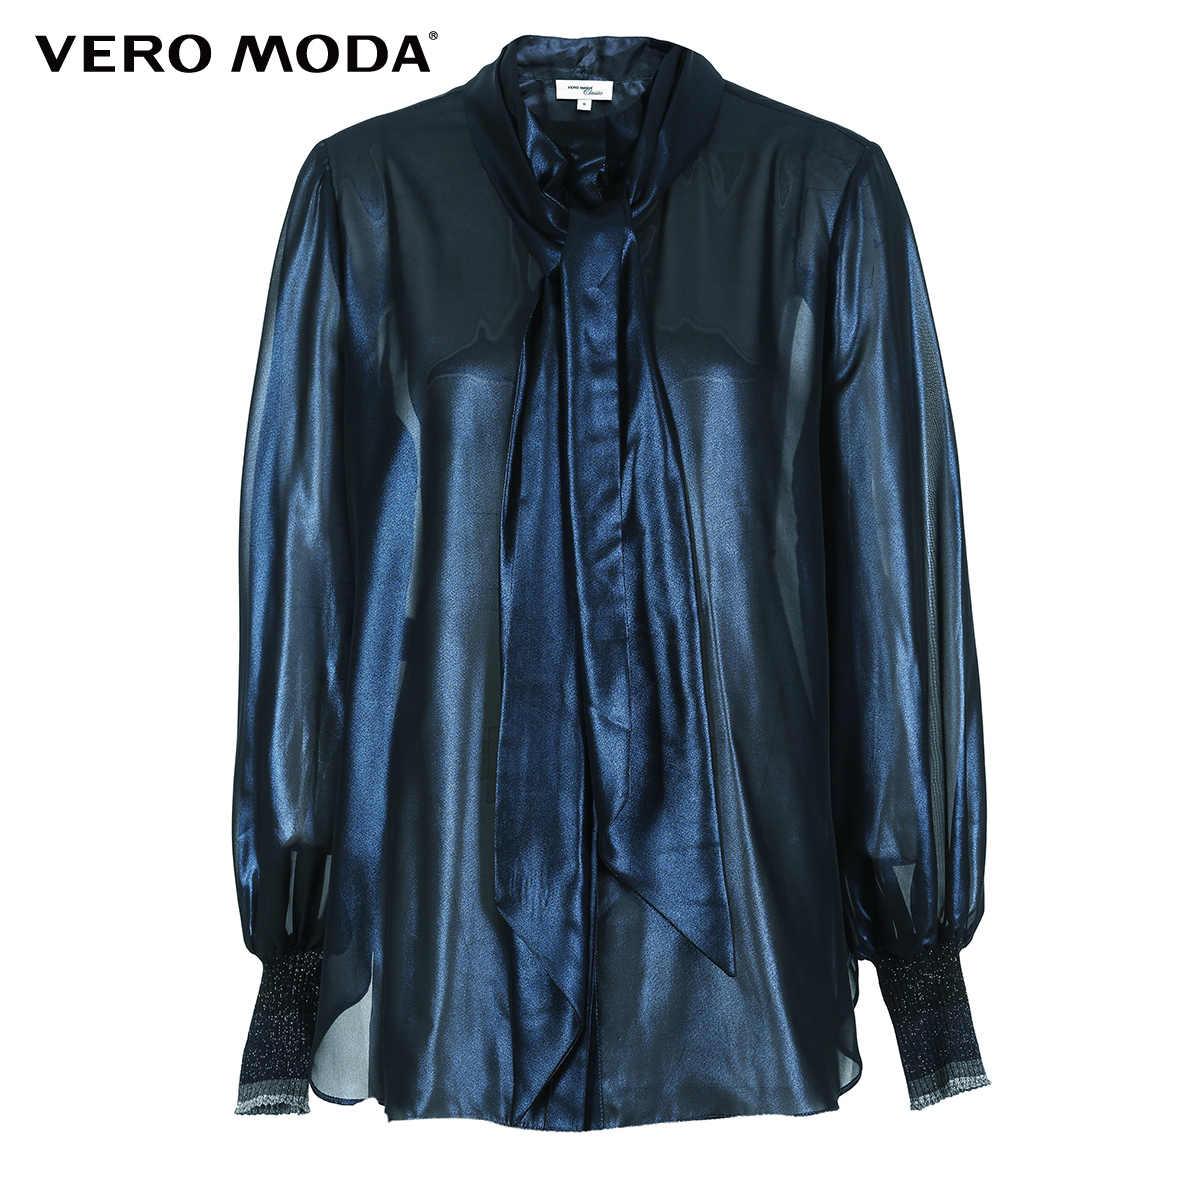 Vero Moda נשים של מתכת מצופה בד דקורטיבי סרט חולצה | 319105507